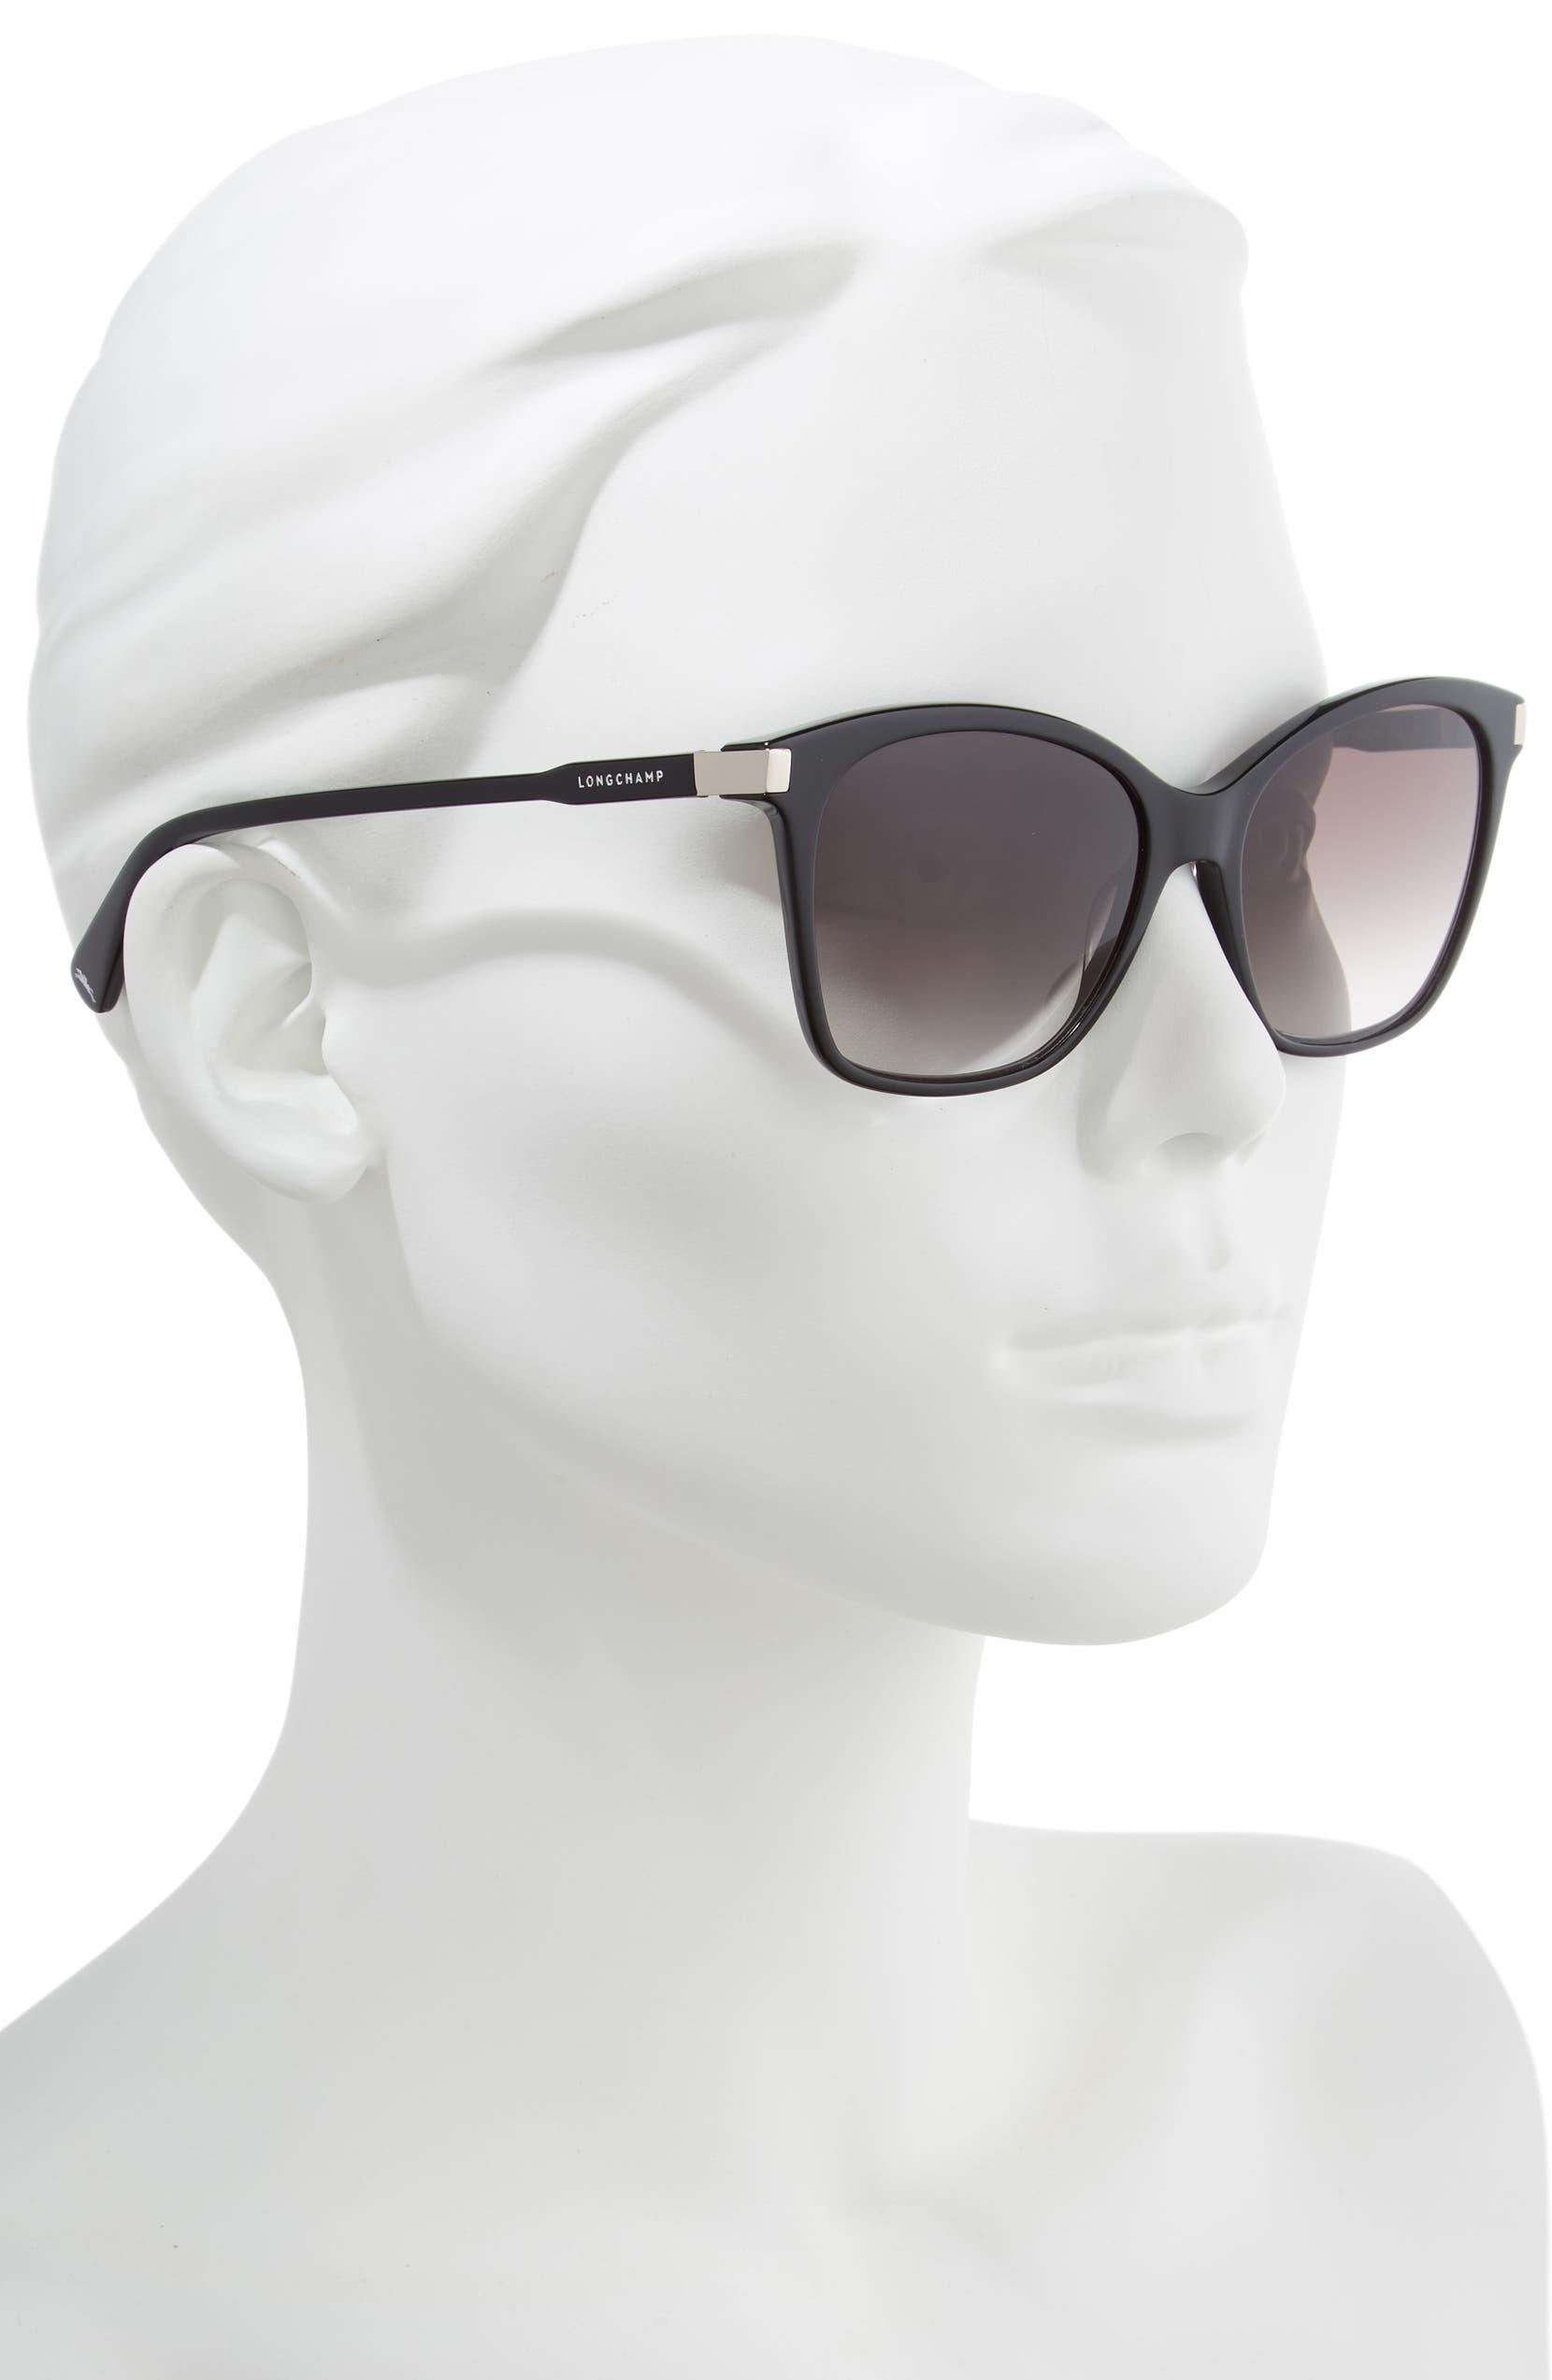 feffca3ba8 Longchamp Le Pliage 54mm Butterfly Sunglasses